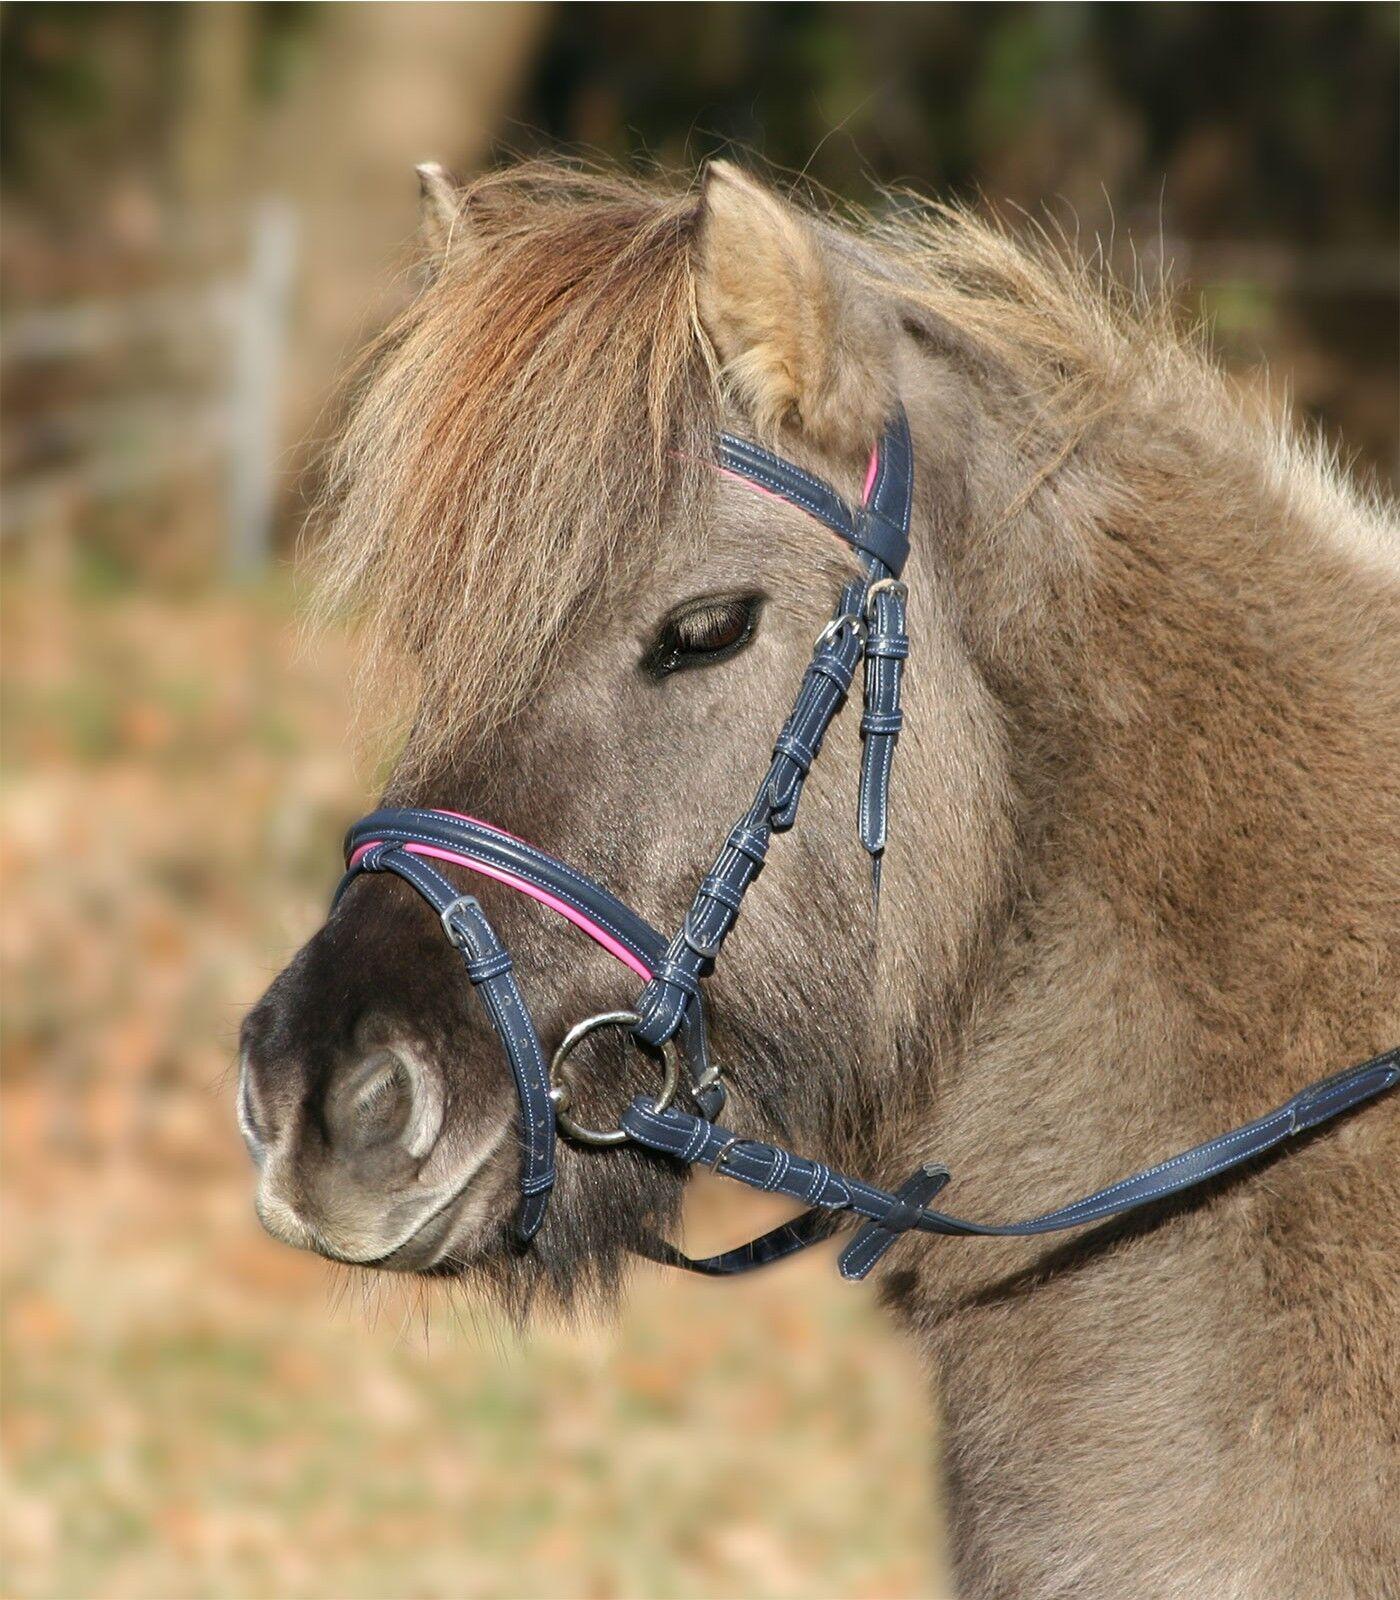 Brida, Ponytrense, Brida, Ponytrensenzaum Unicorn 2  , blue Noche   Fucsia  shop makes buying and selling